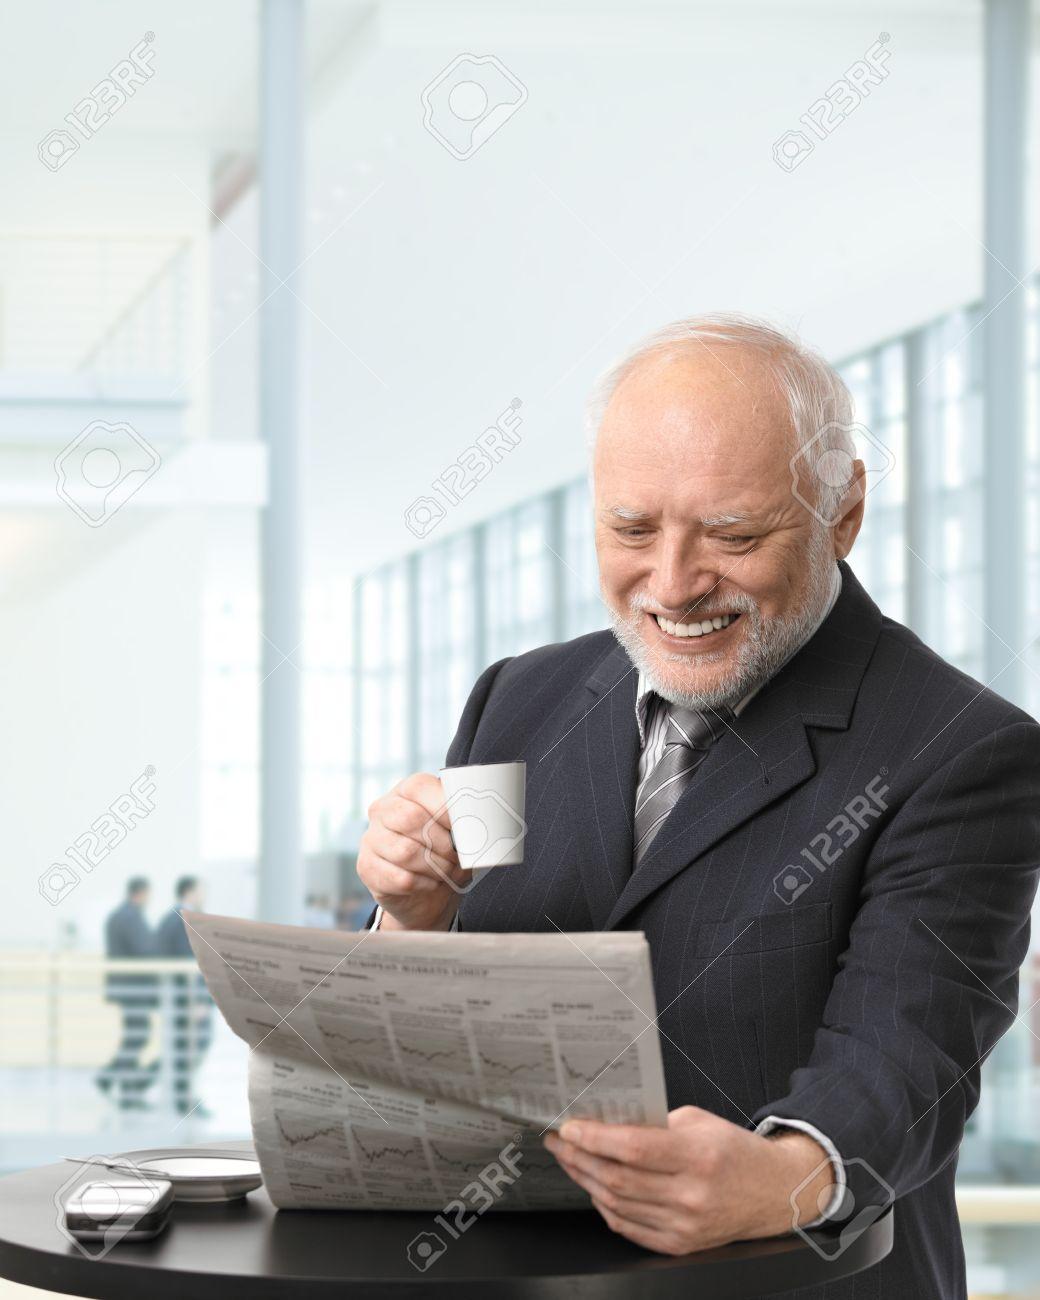 Image result for senior business man reading stock